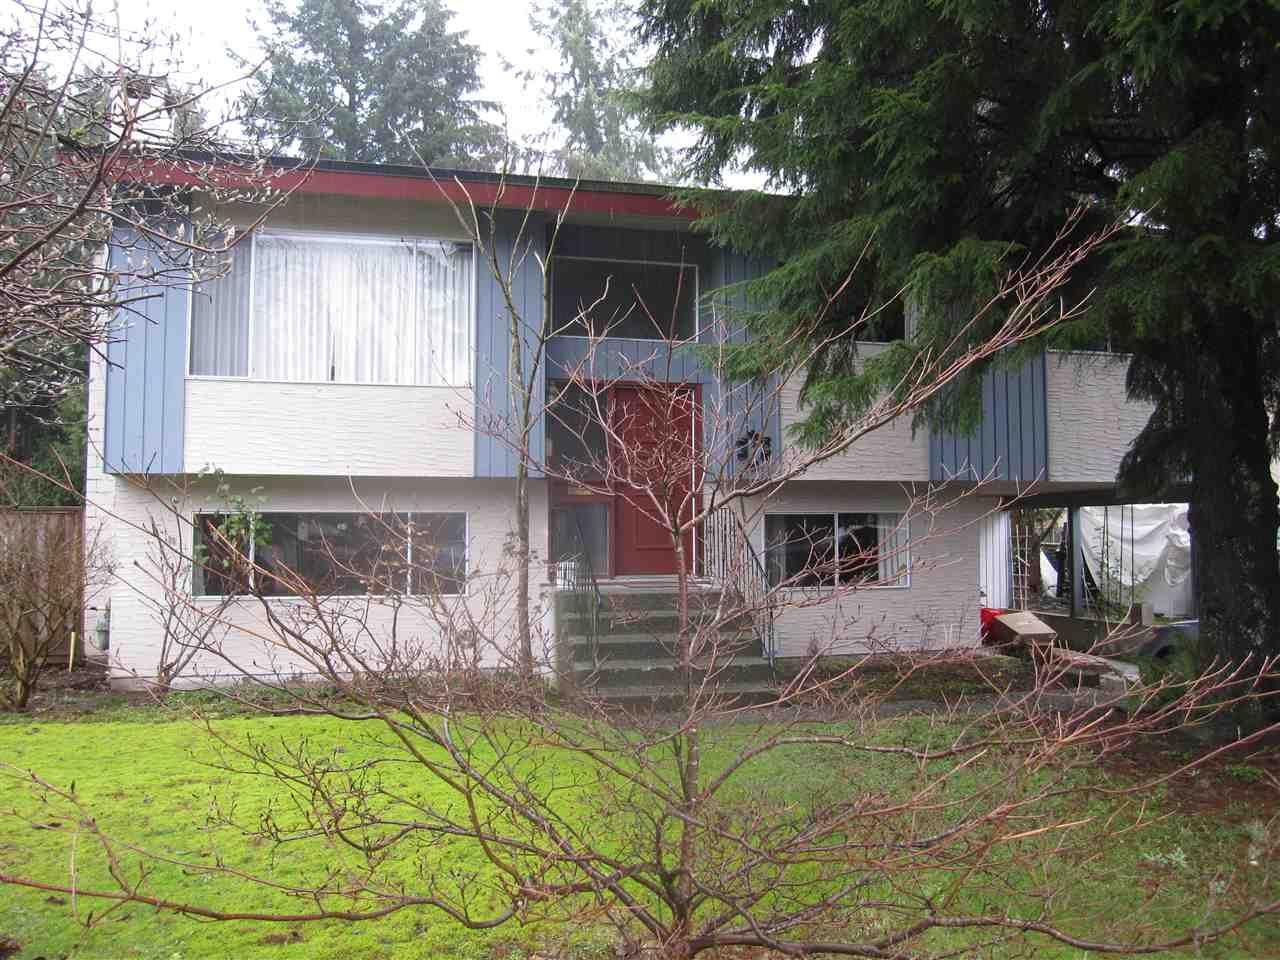 Main Photo: 11724 209 Street in Maple Ridge: Southwest Maple Ridge House for sale : MLS®# R2434650